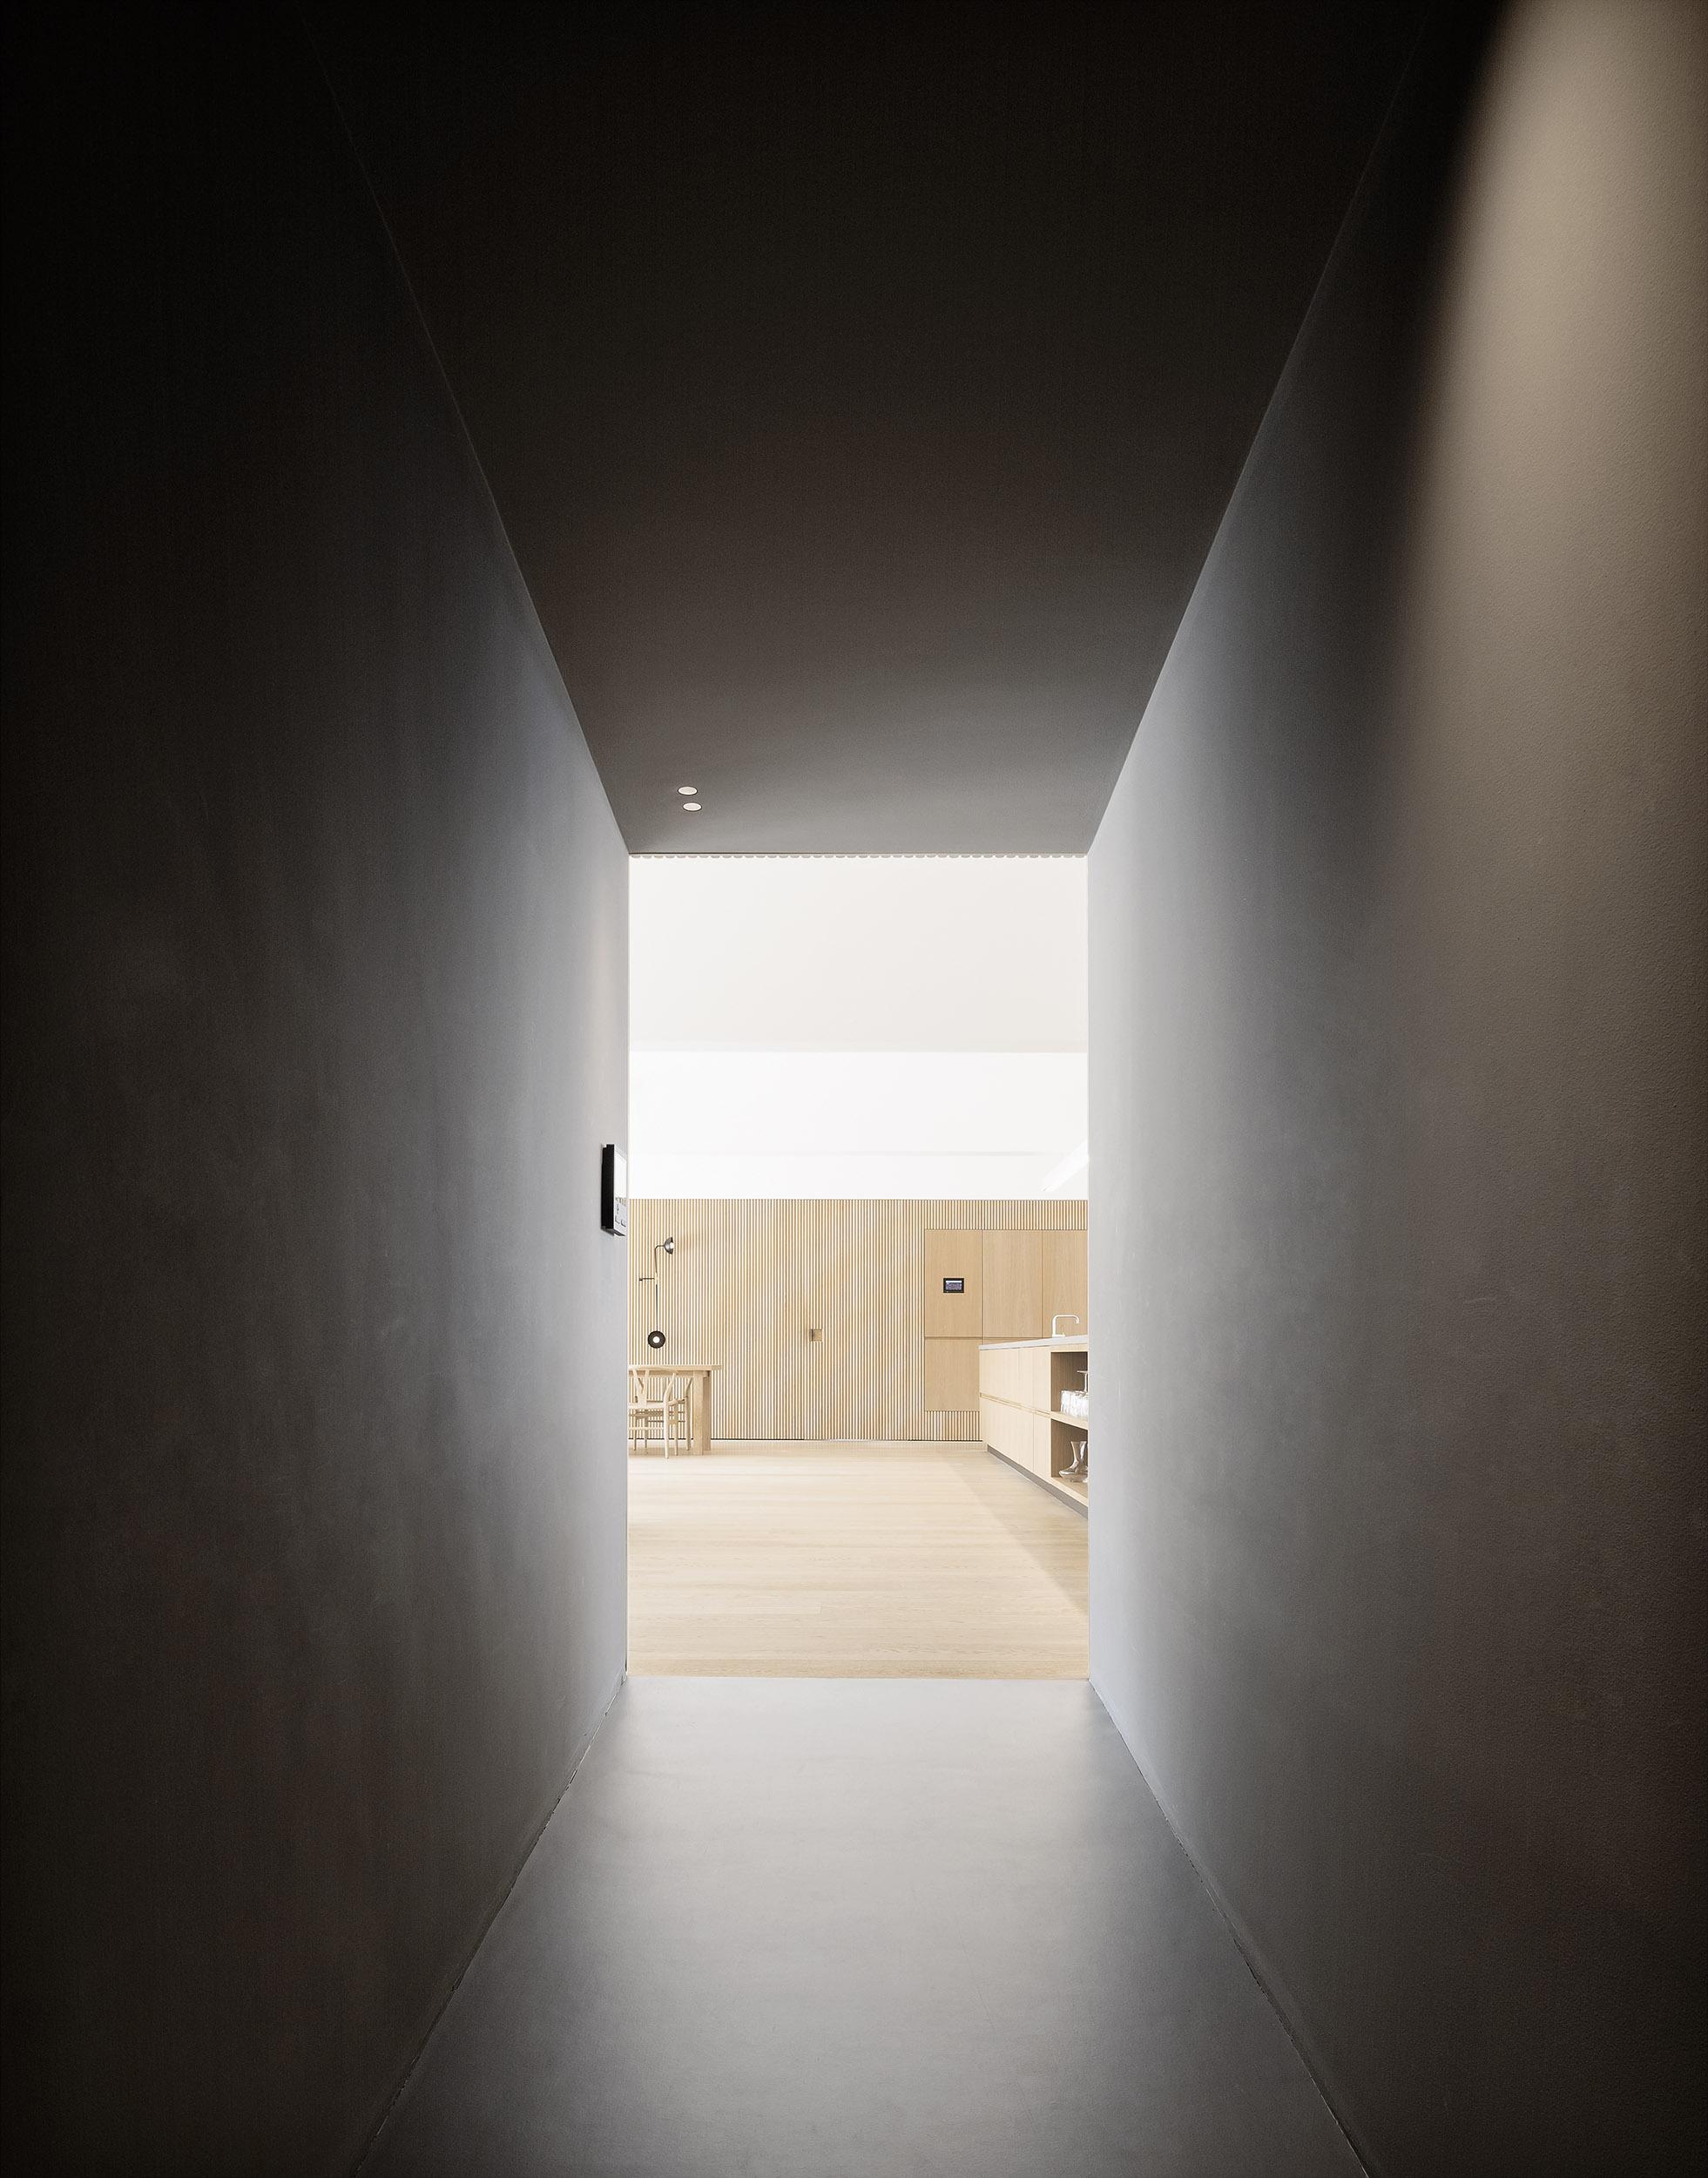 kaestle&ocker - Loftwohnung